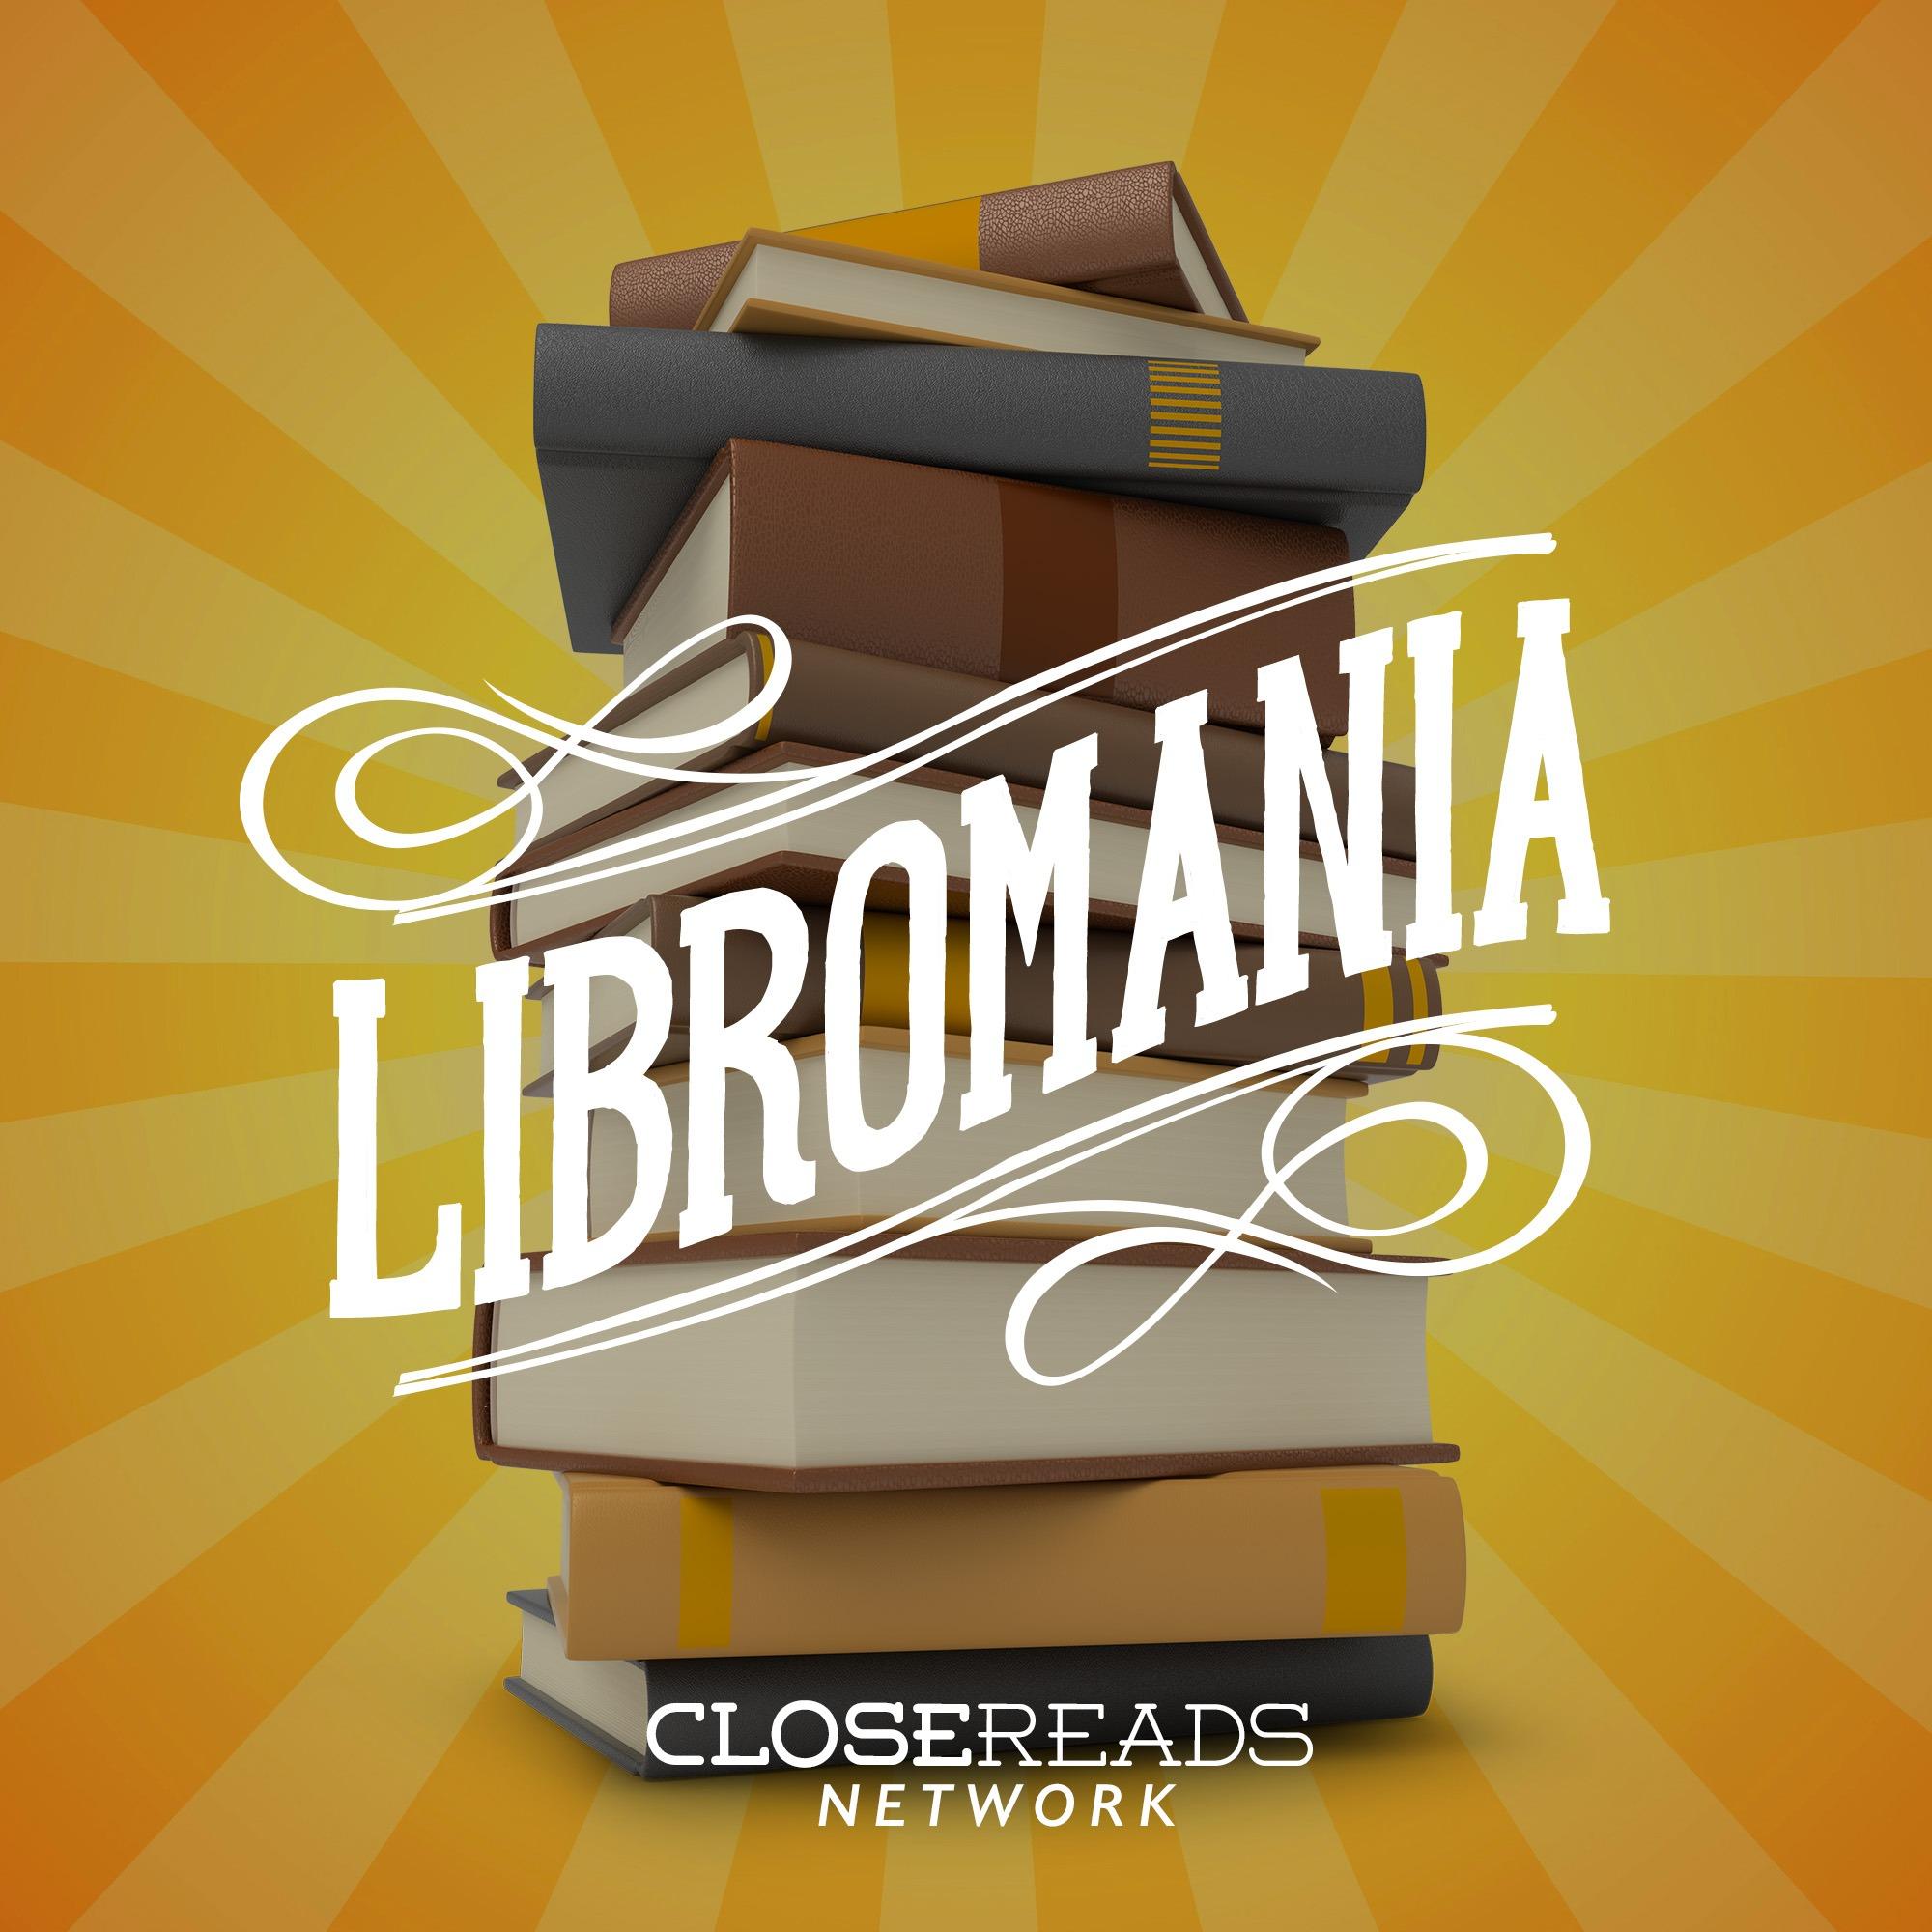 Libromania